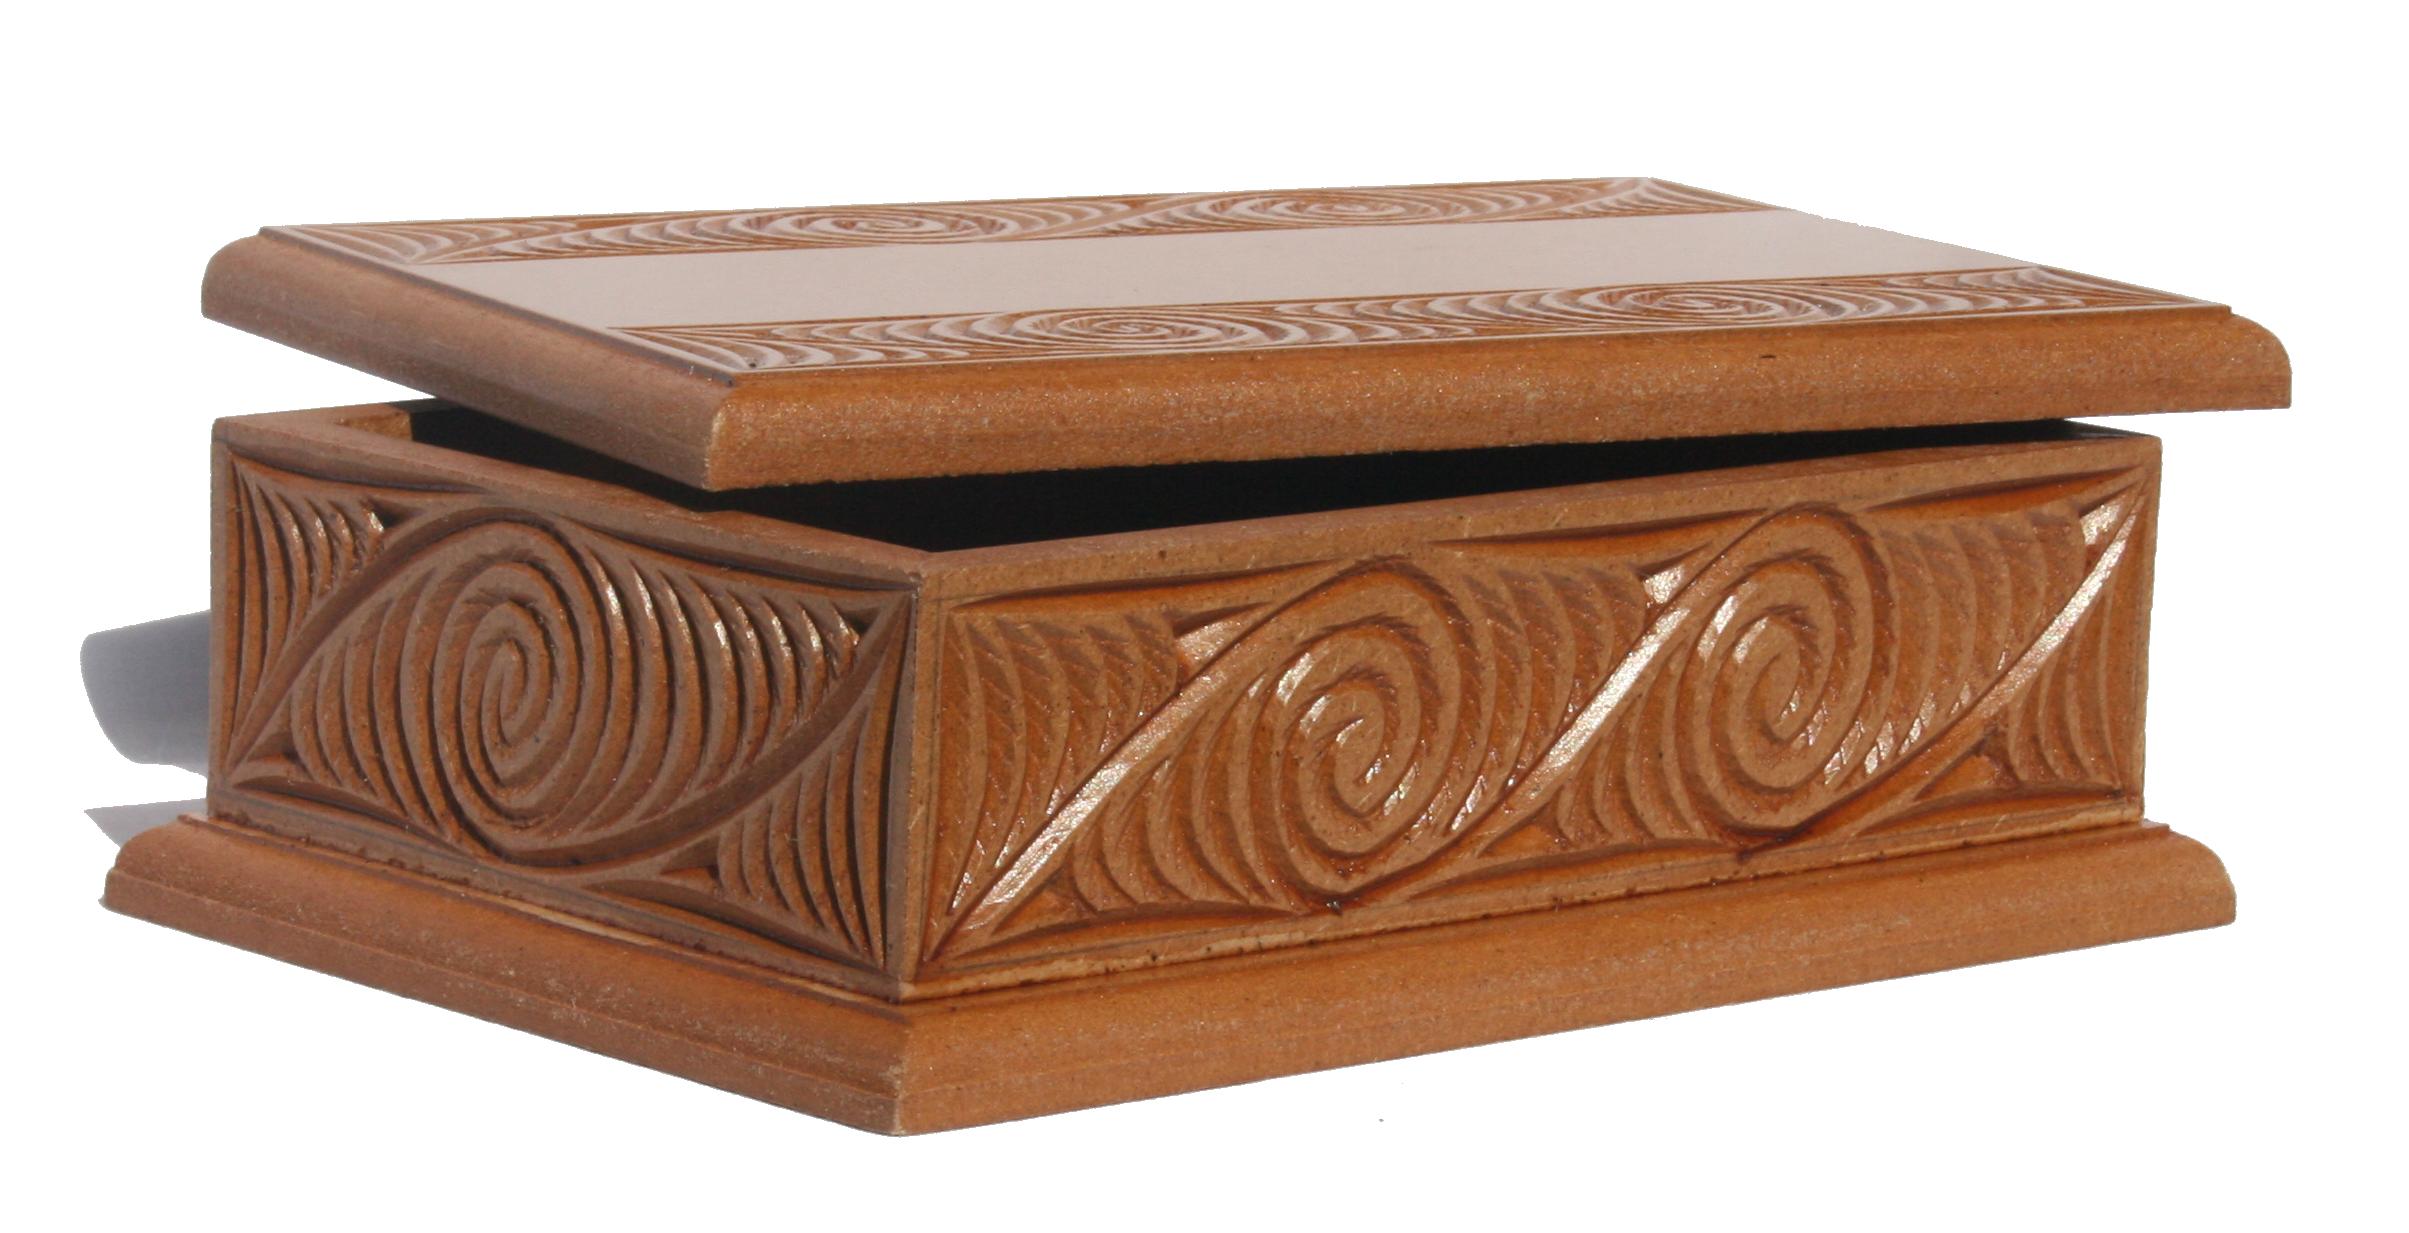 Medium carved box